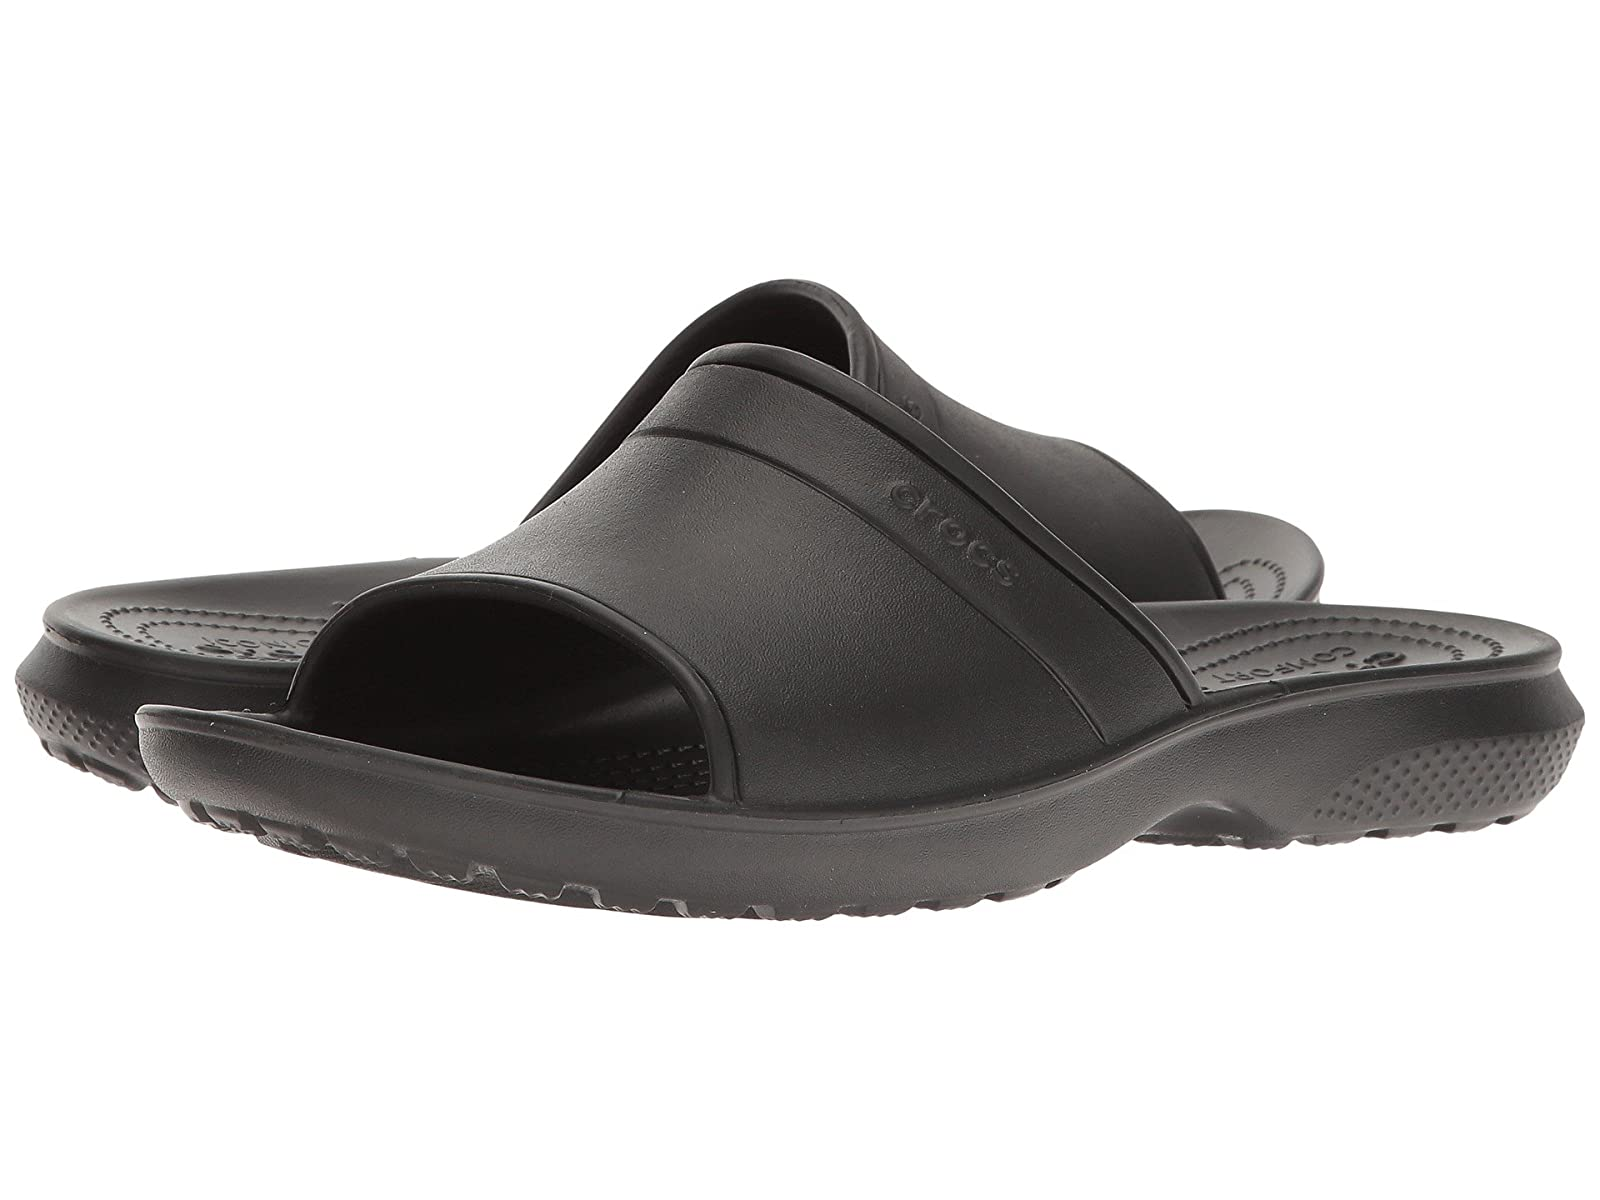 Crocs Classic SlideComfortable and distinctive shoes